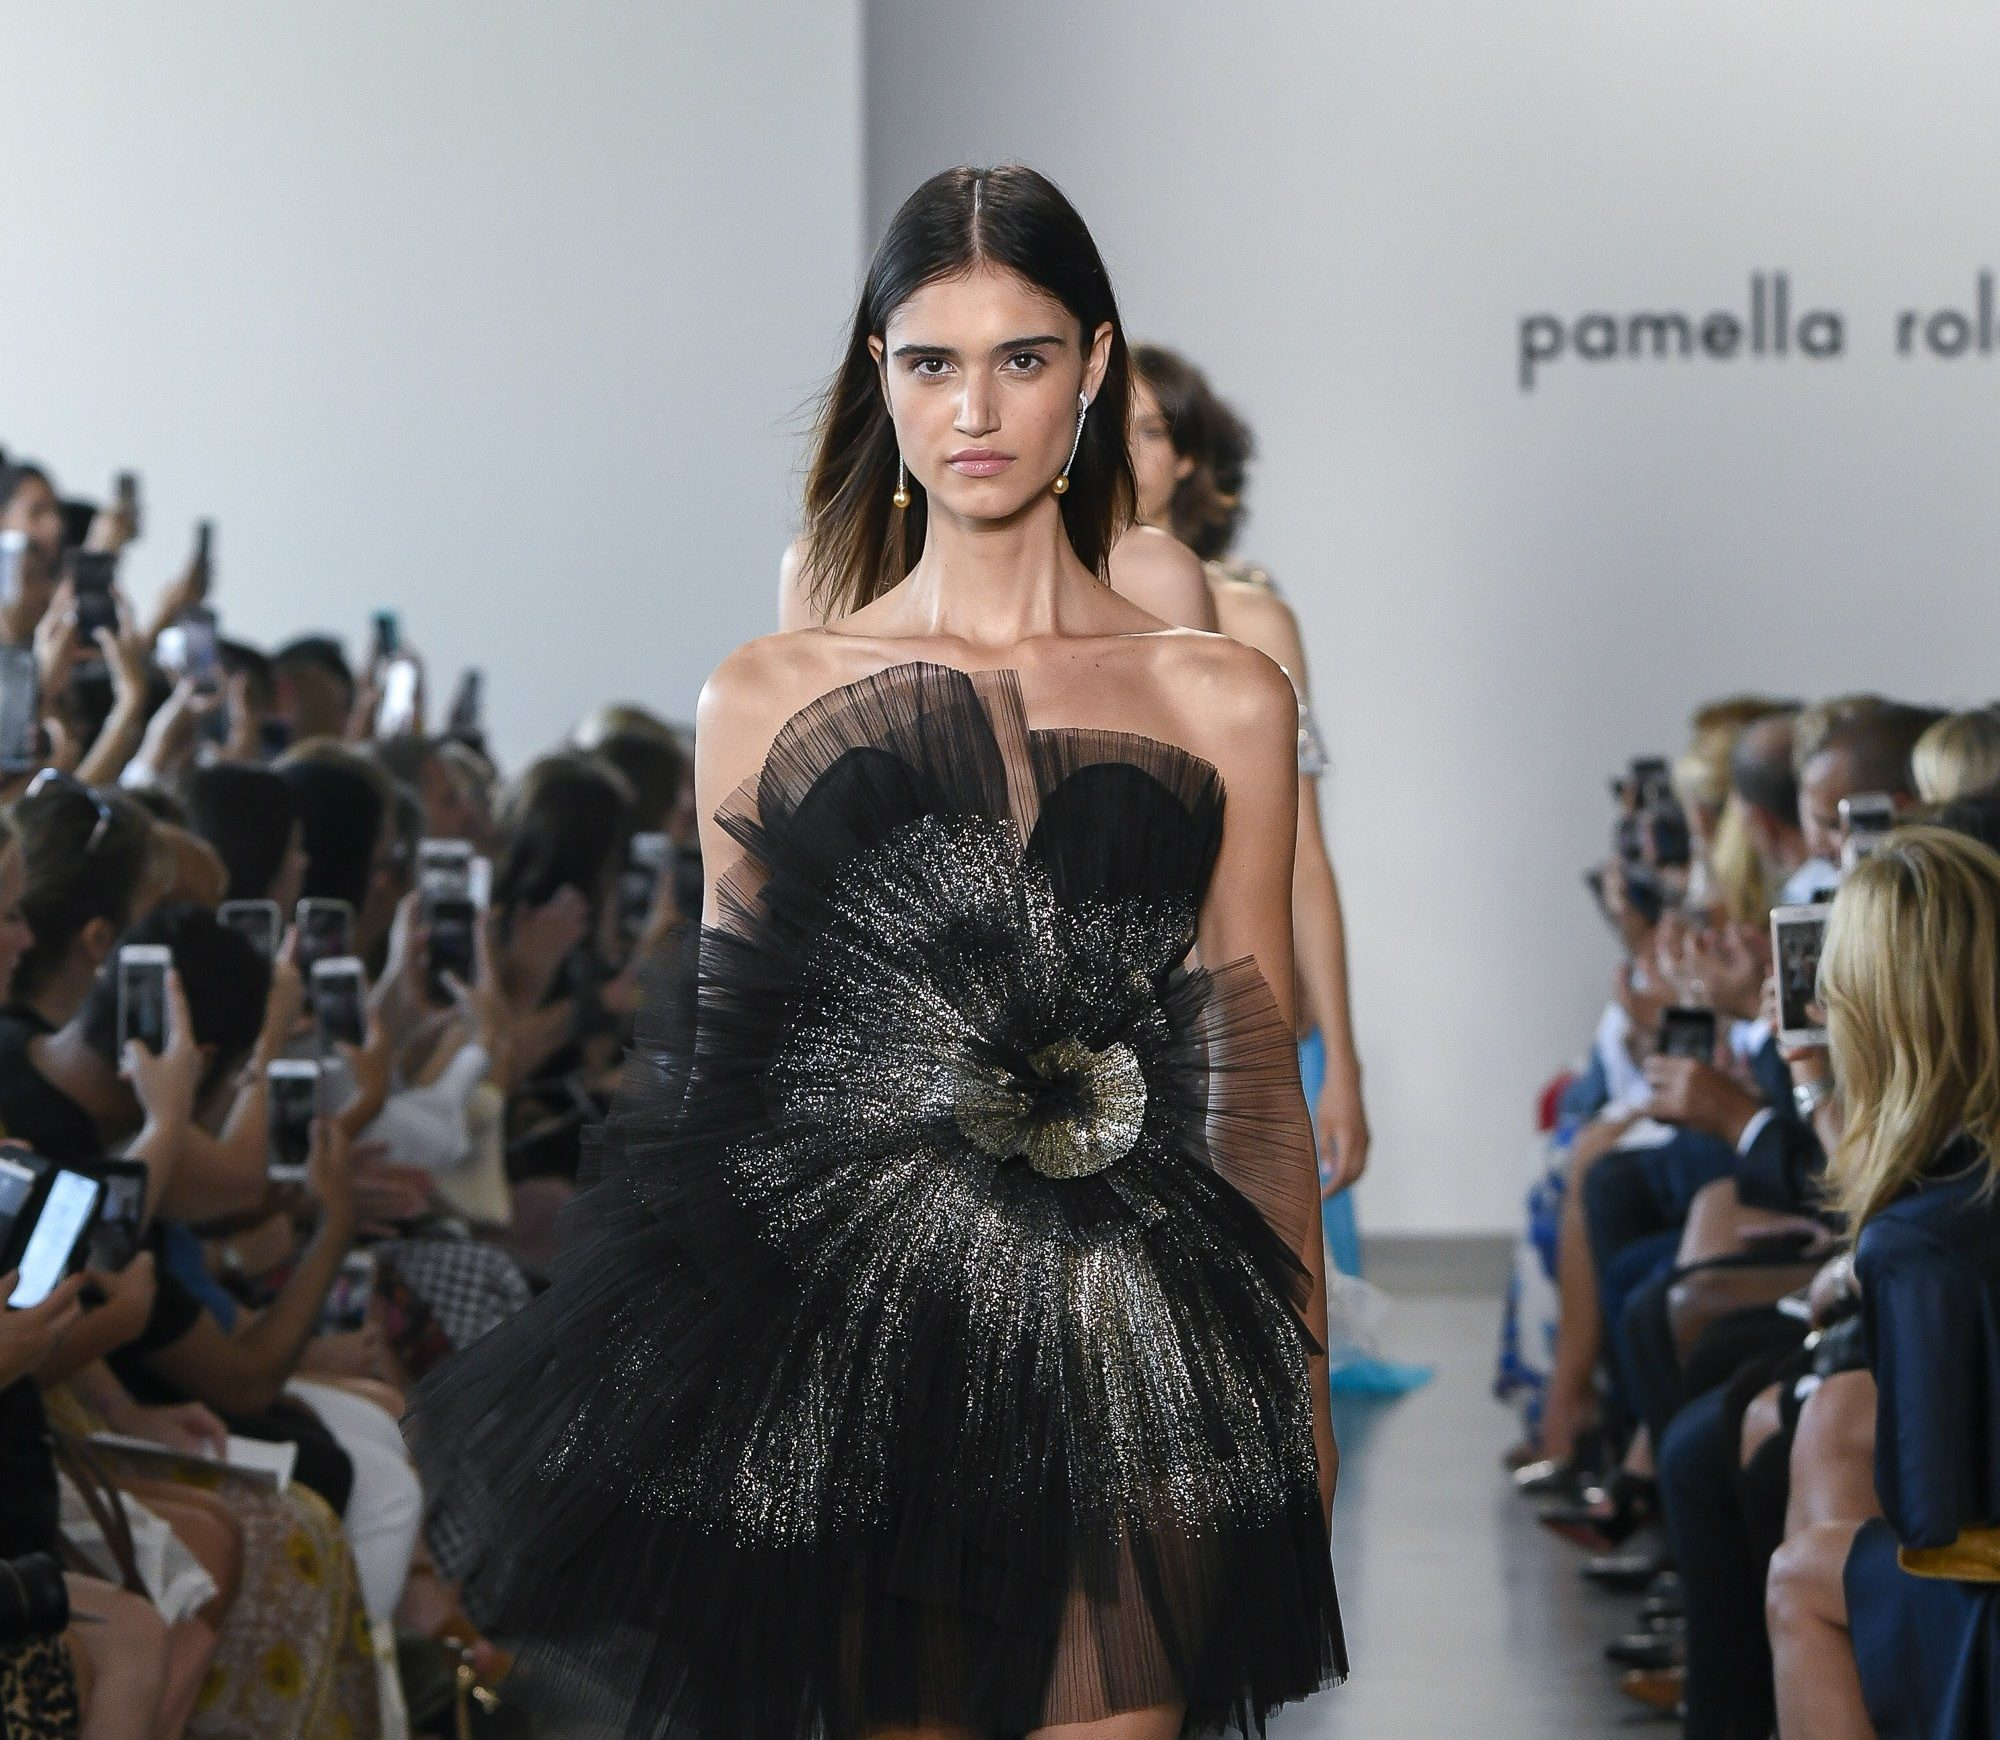 b15d0e0d Pamella Roland Spring 2019 RTW | The Garnette Report